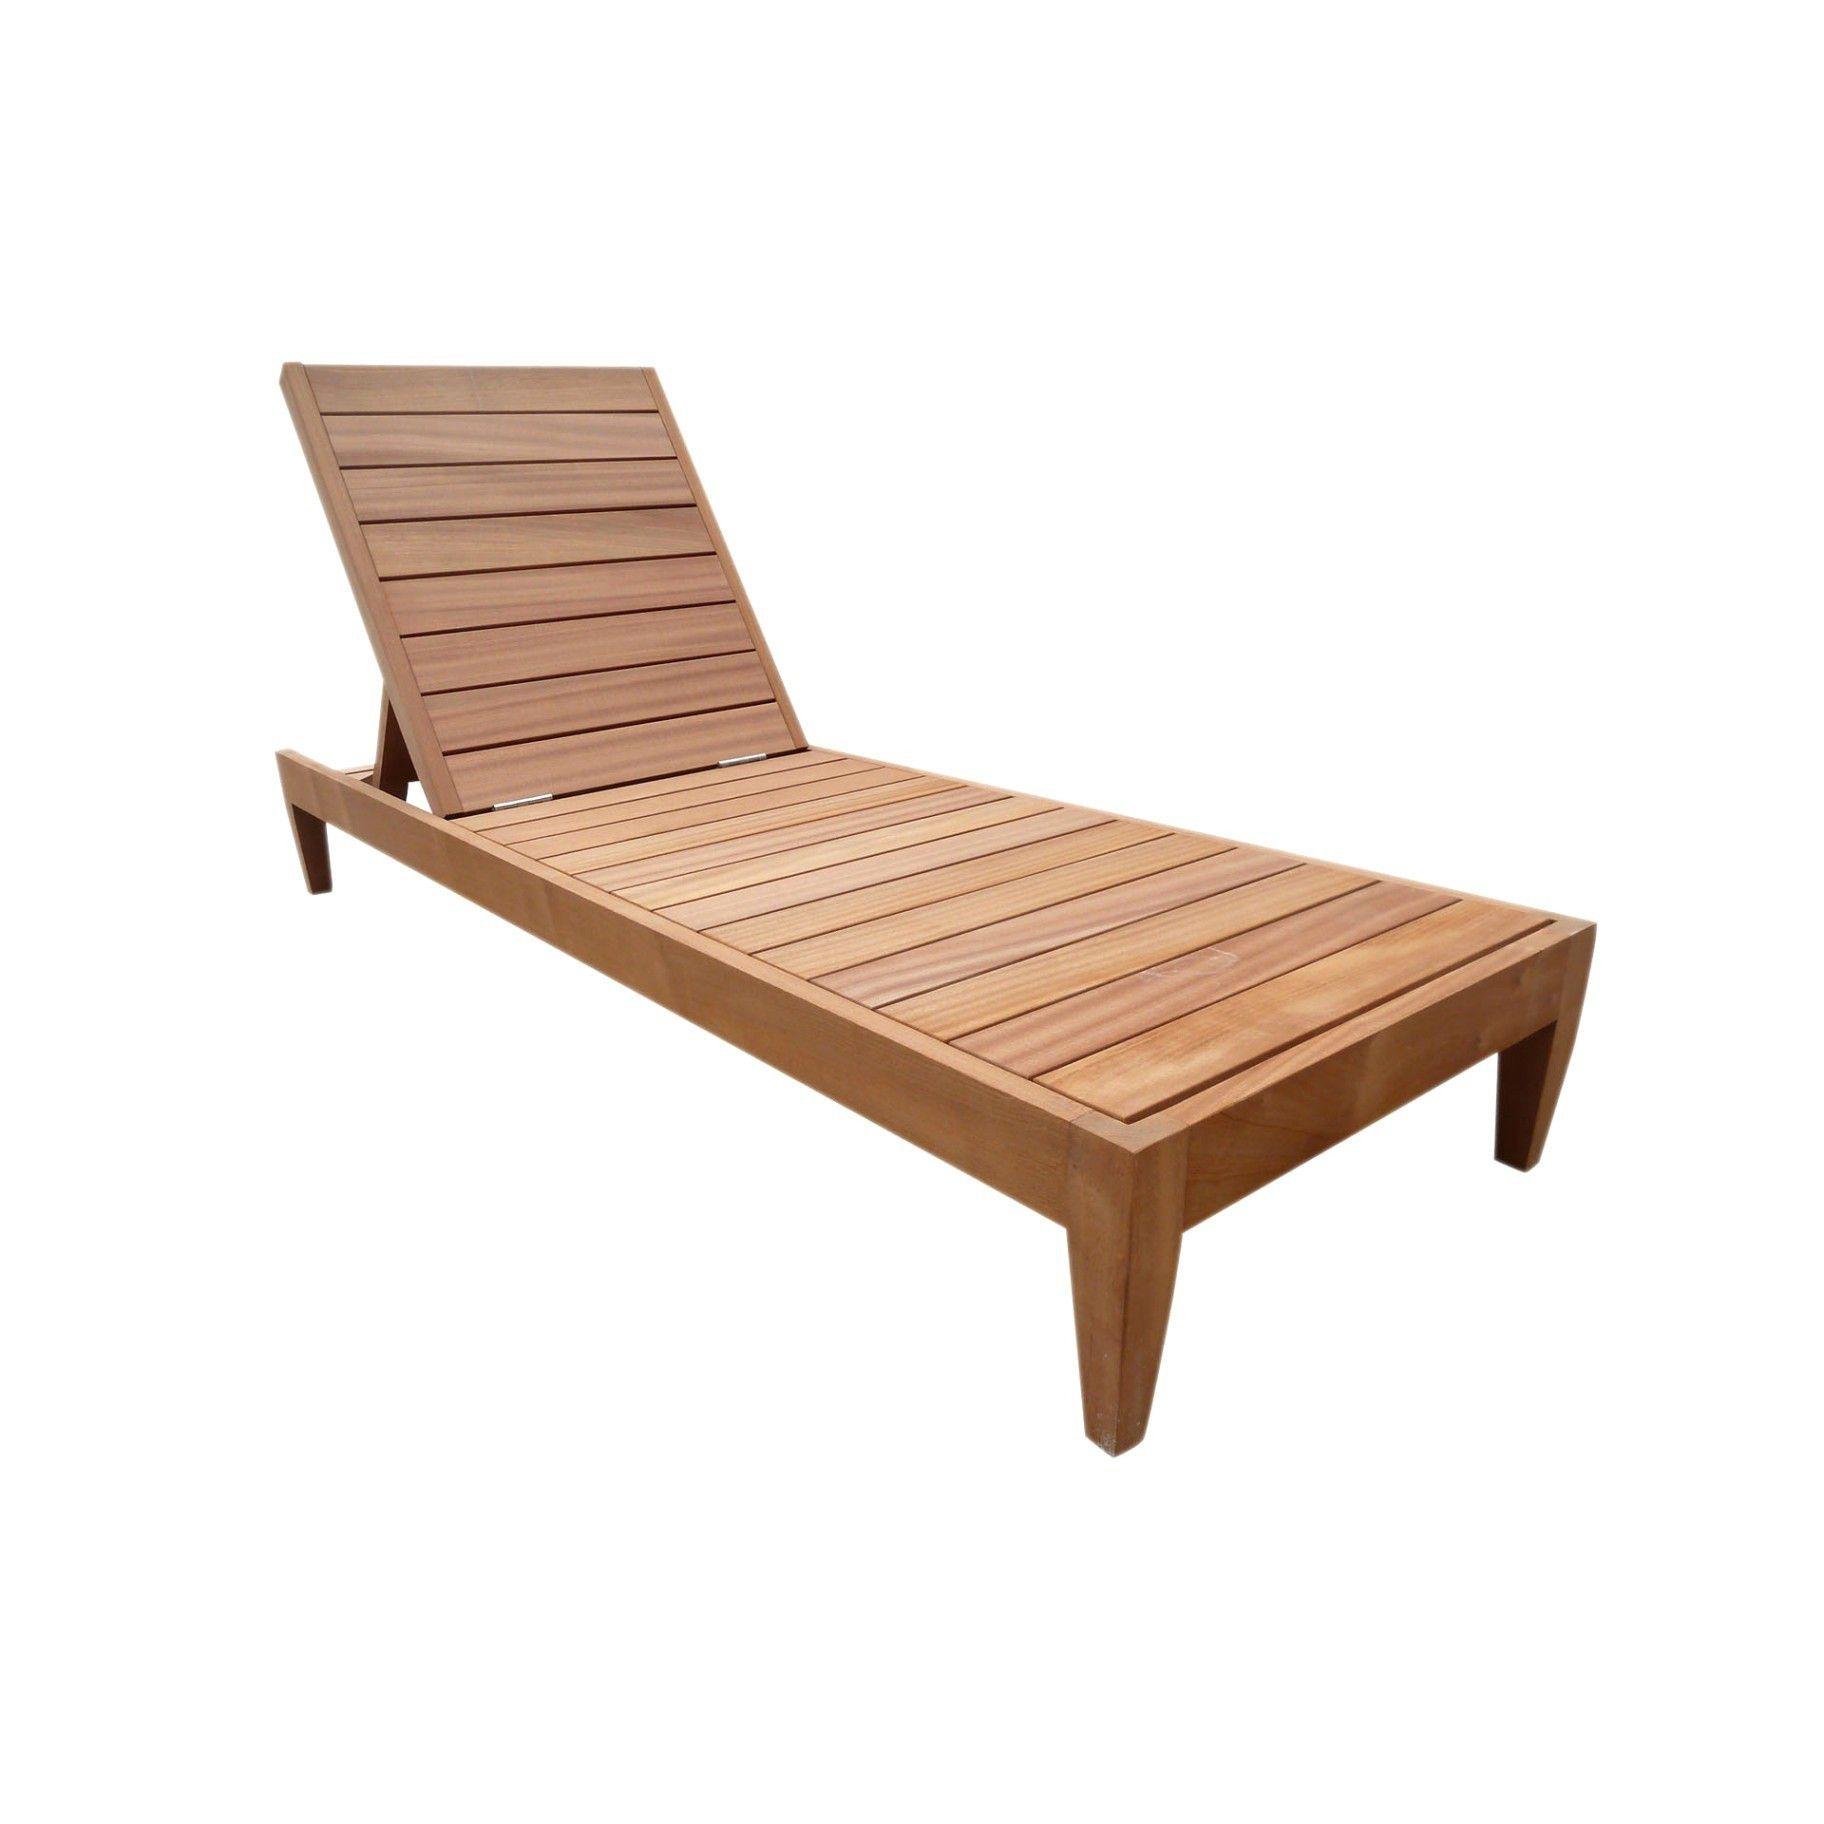 Bauhaus sofa Elegant Big Sessel Patio Lounge Chair New